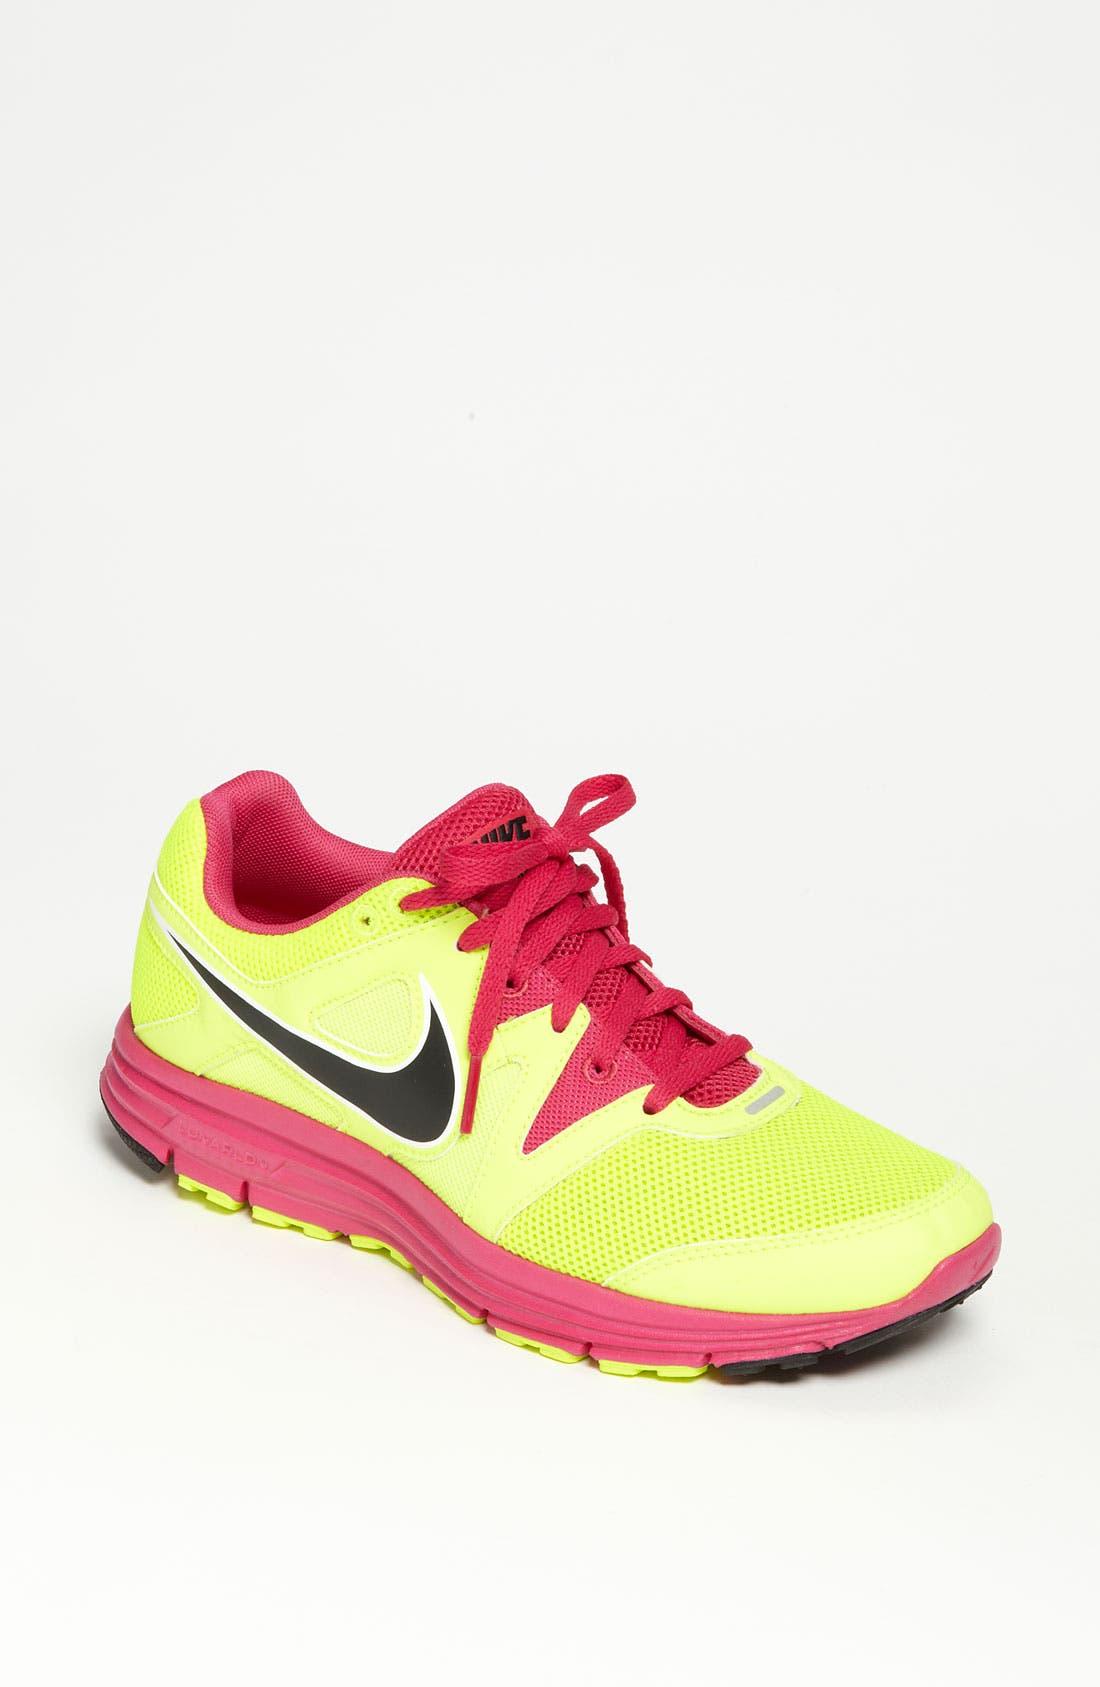 Alternate Image 1 Selected - Nike 'Lunarfly 3' Running Shoe (Women)